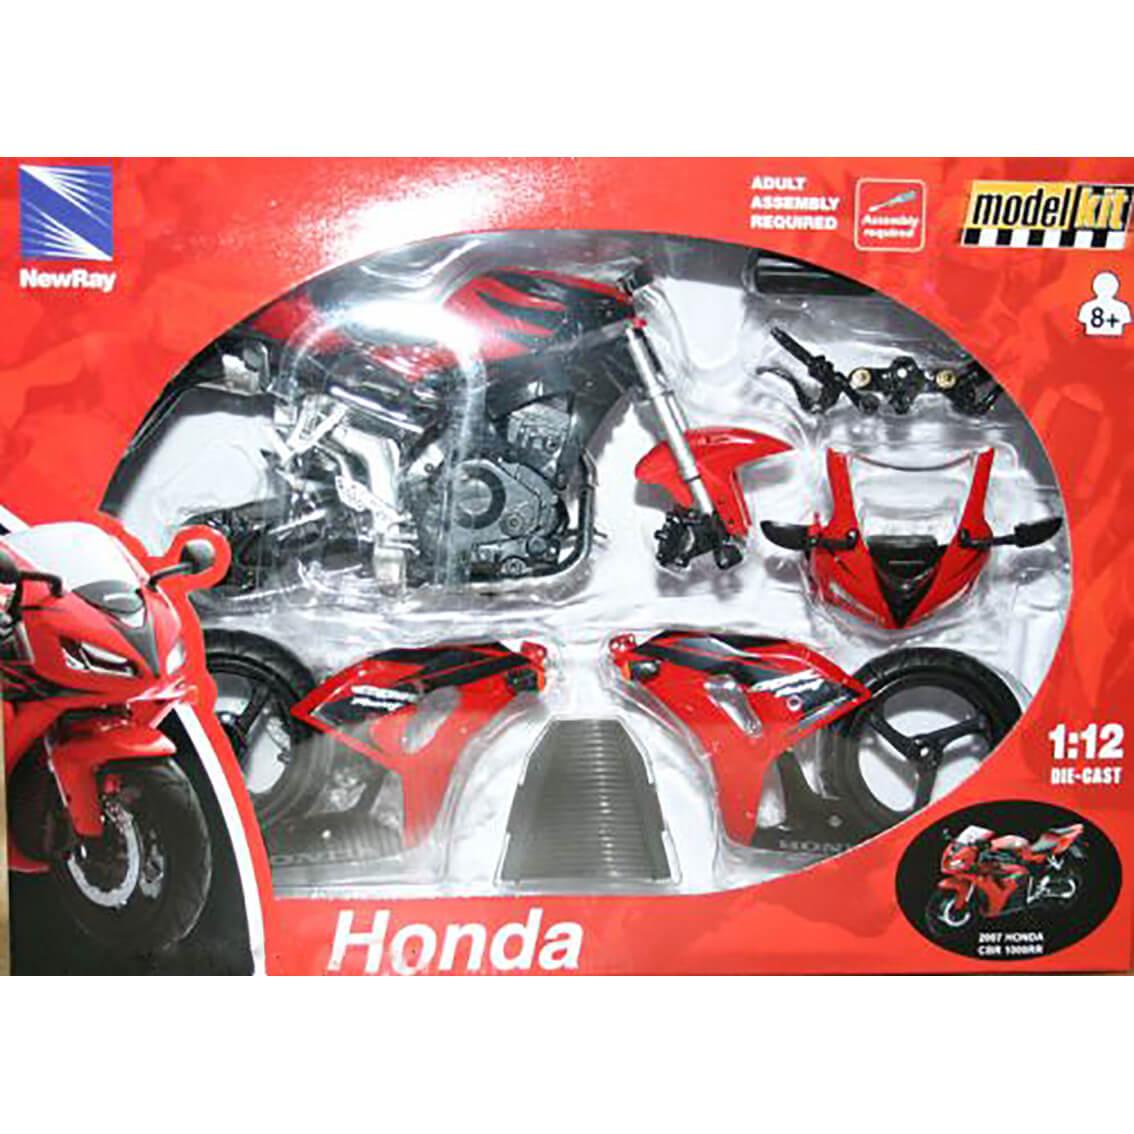 Мотоцикл HONDA 43145